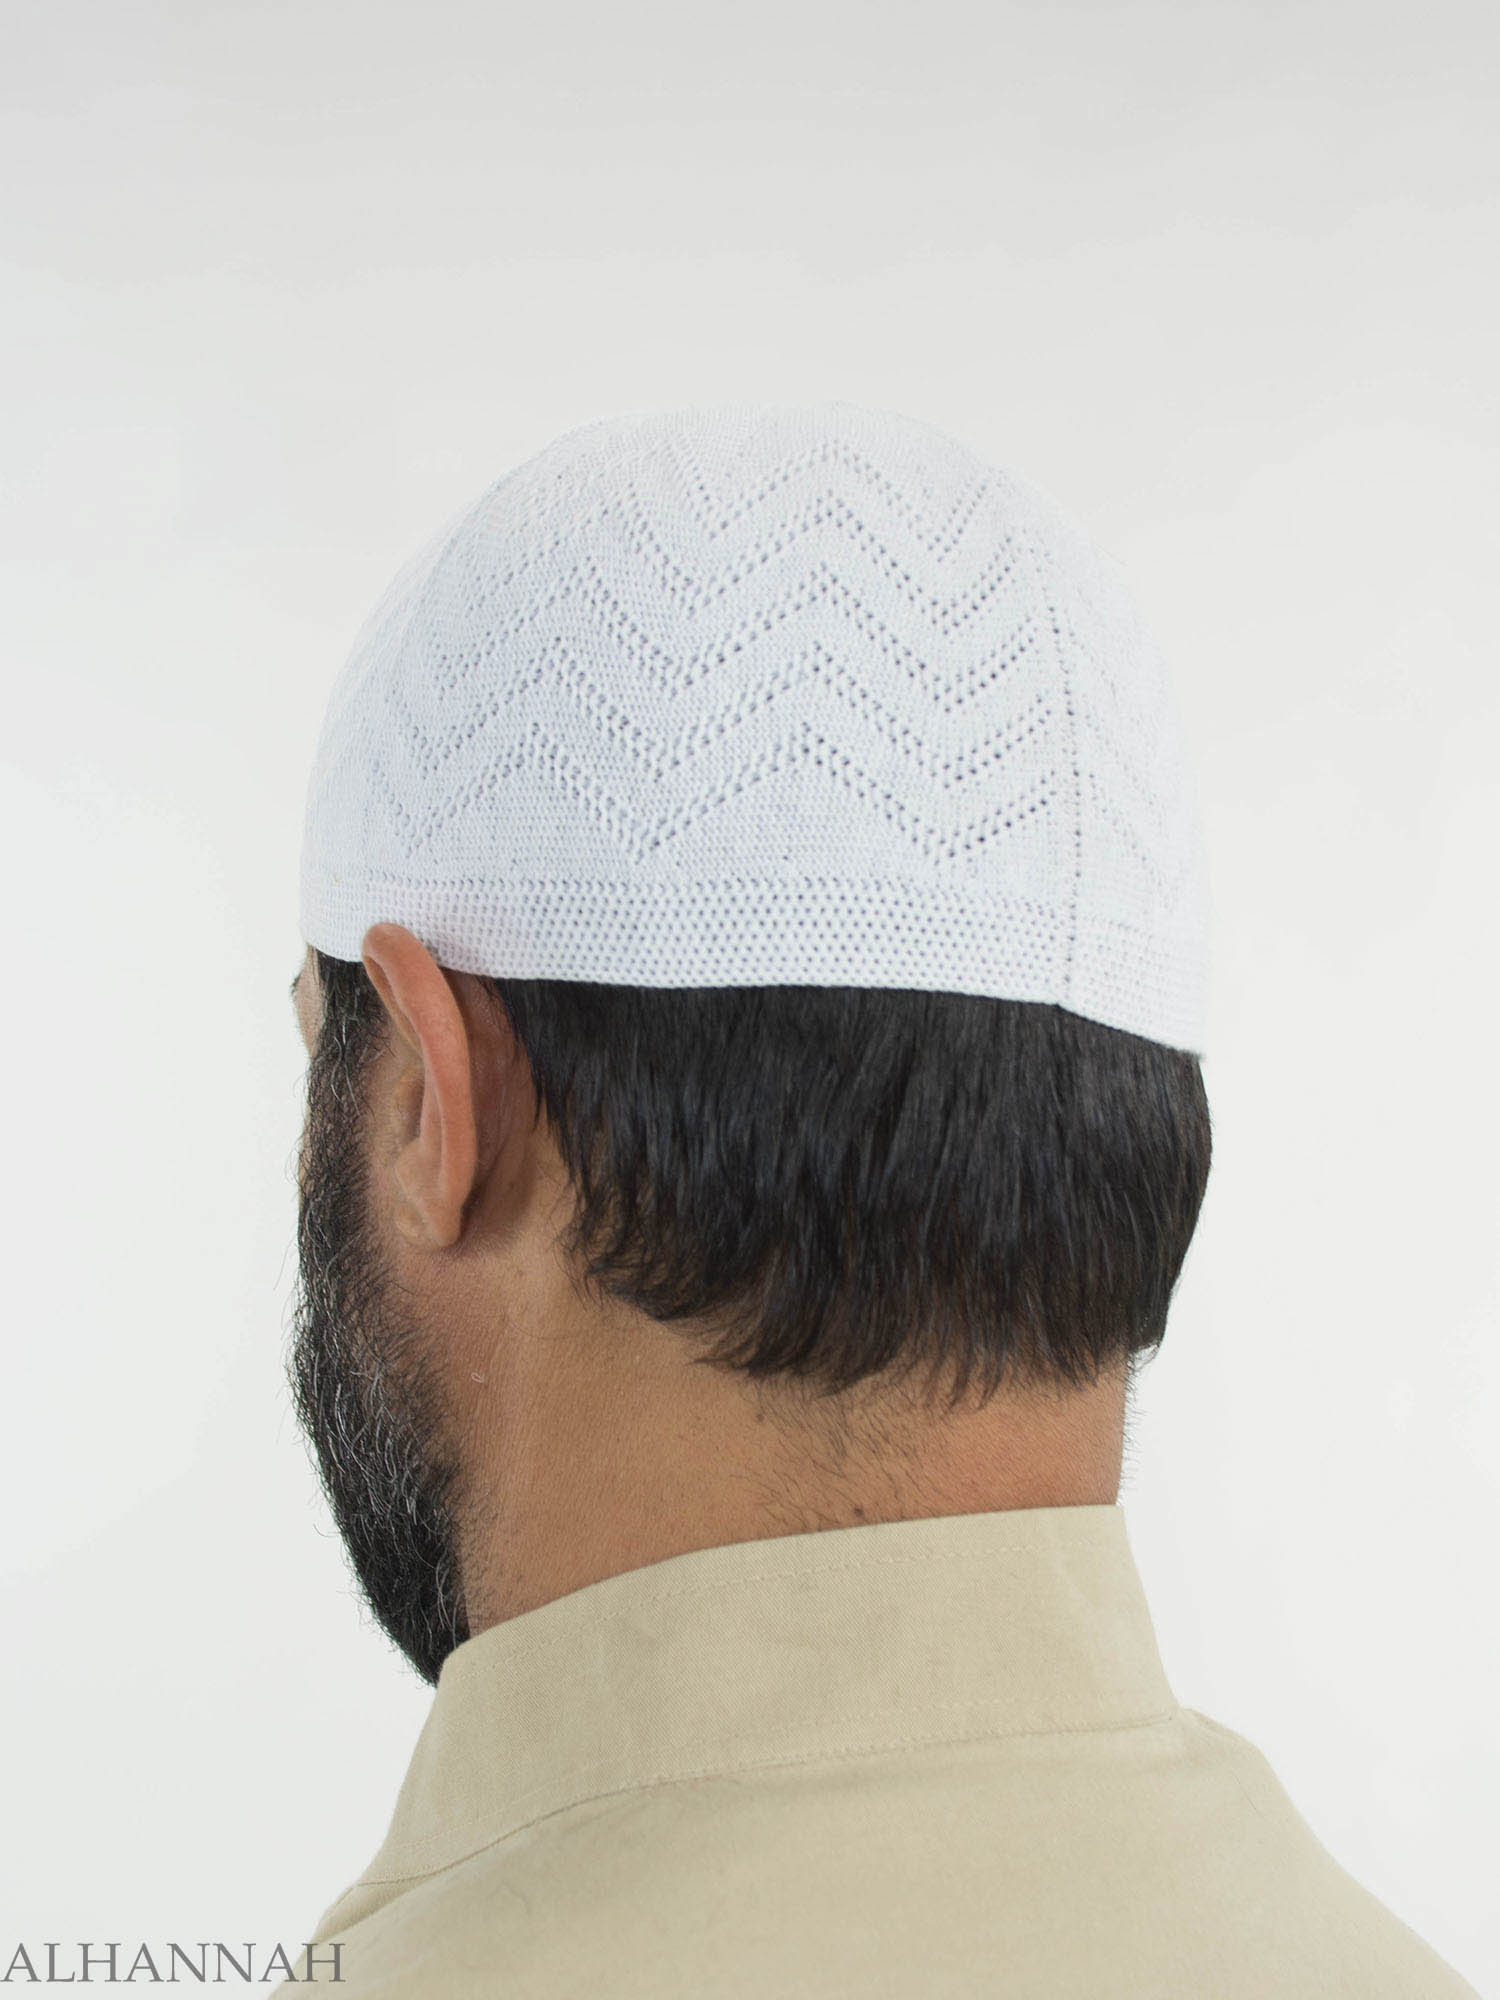 Kufi de algodón tradicional de punto me674 - Alhannah ropa islámica